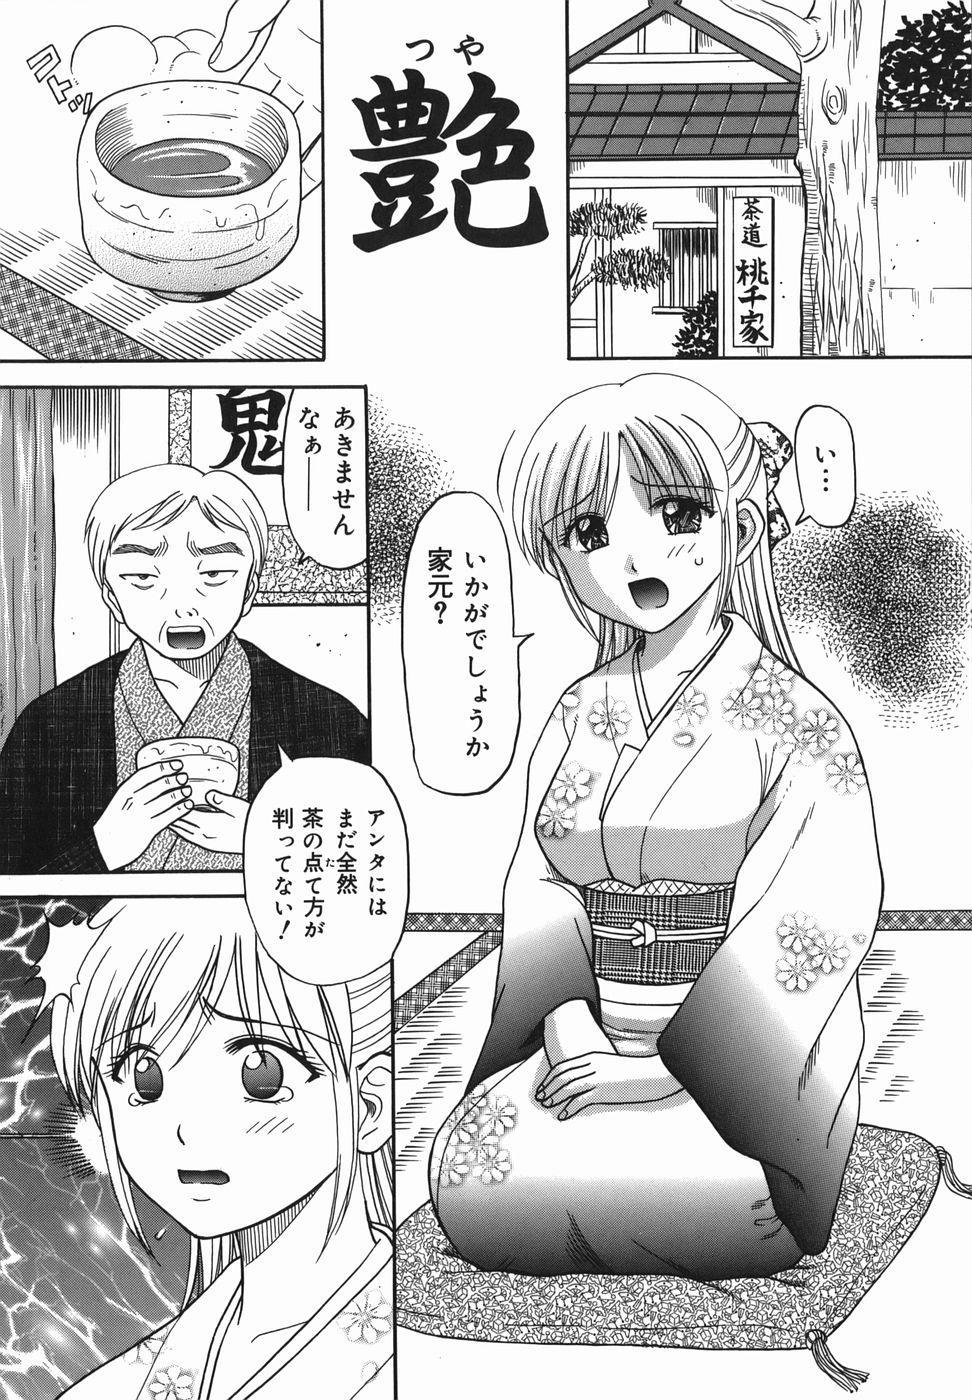 Chijoku Ganbo 140